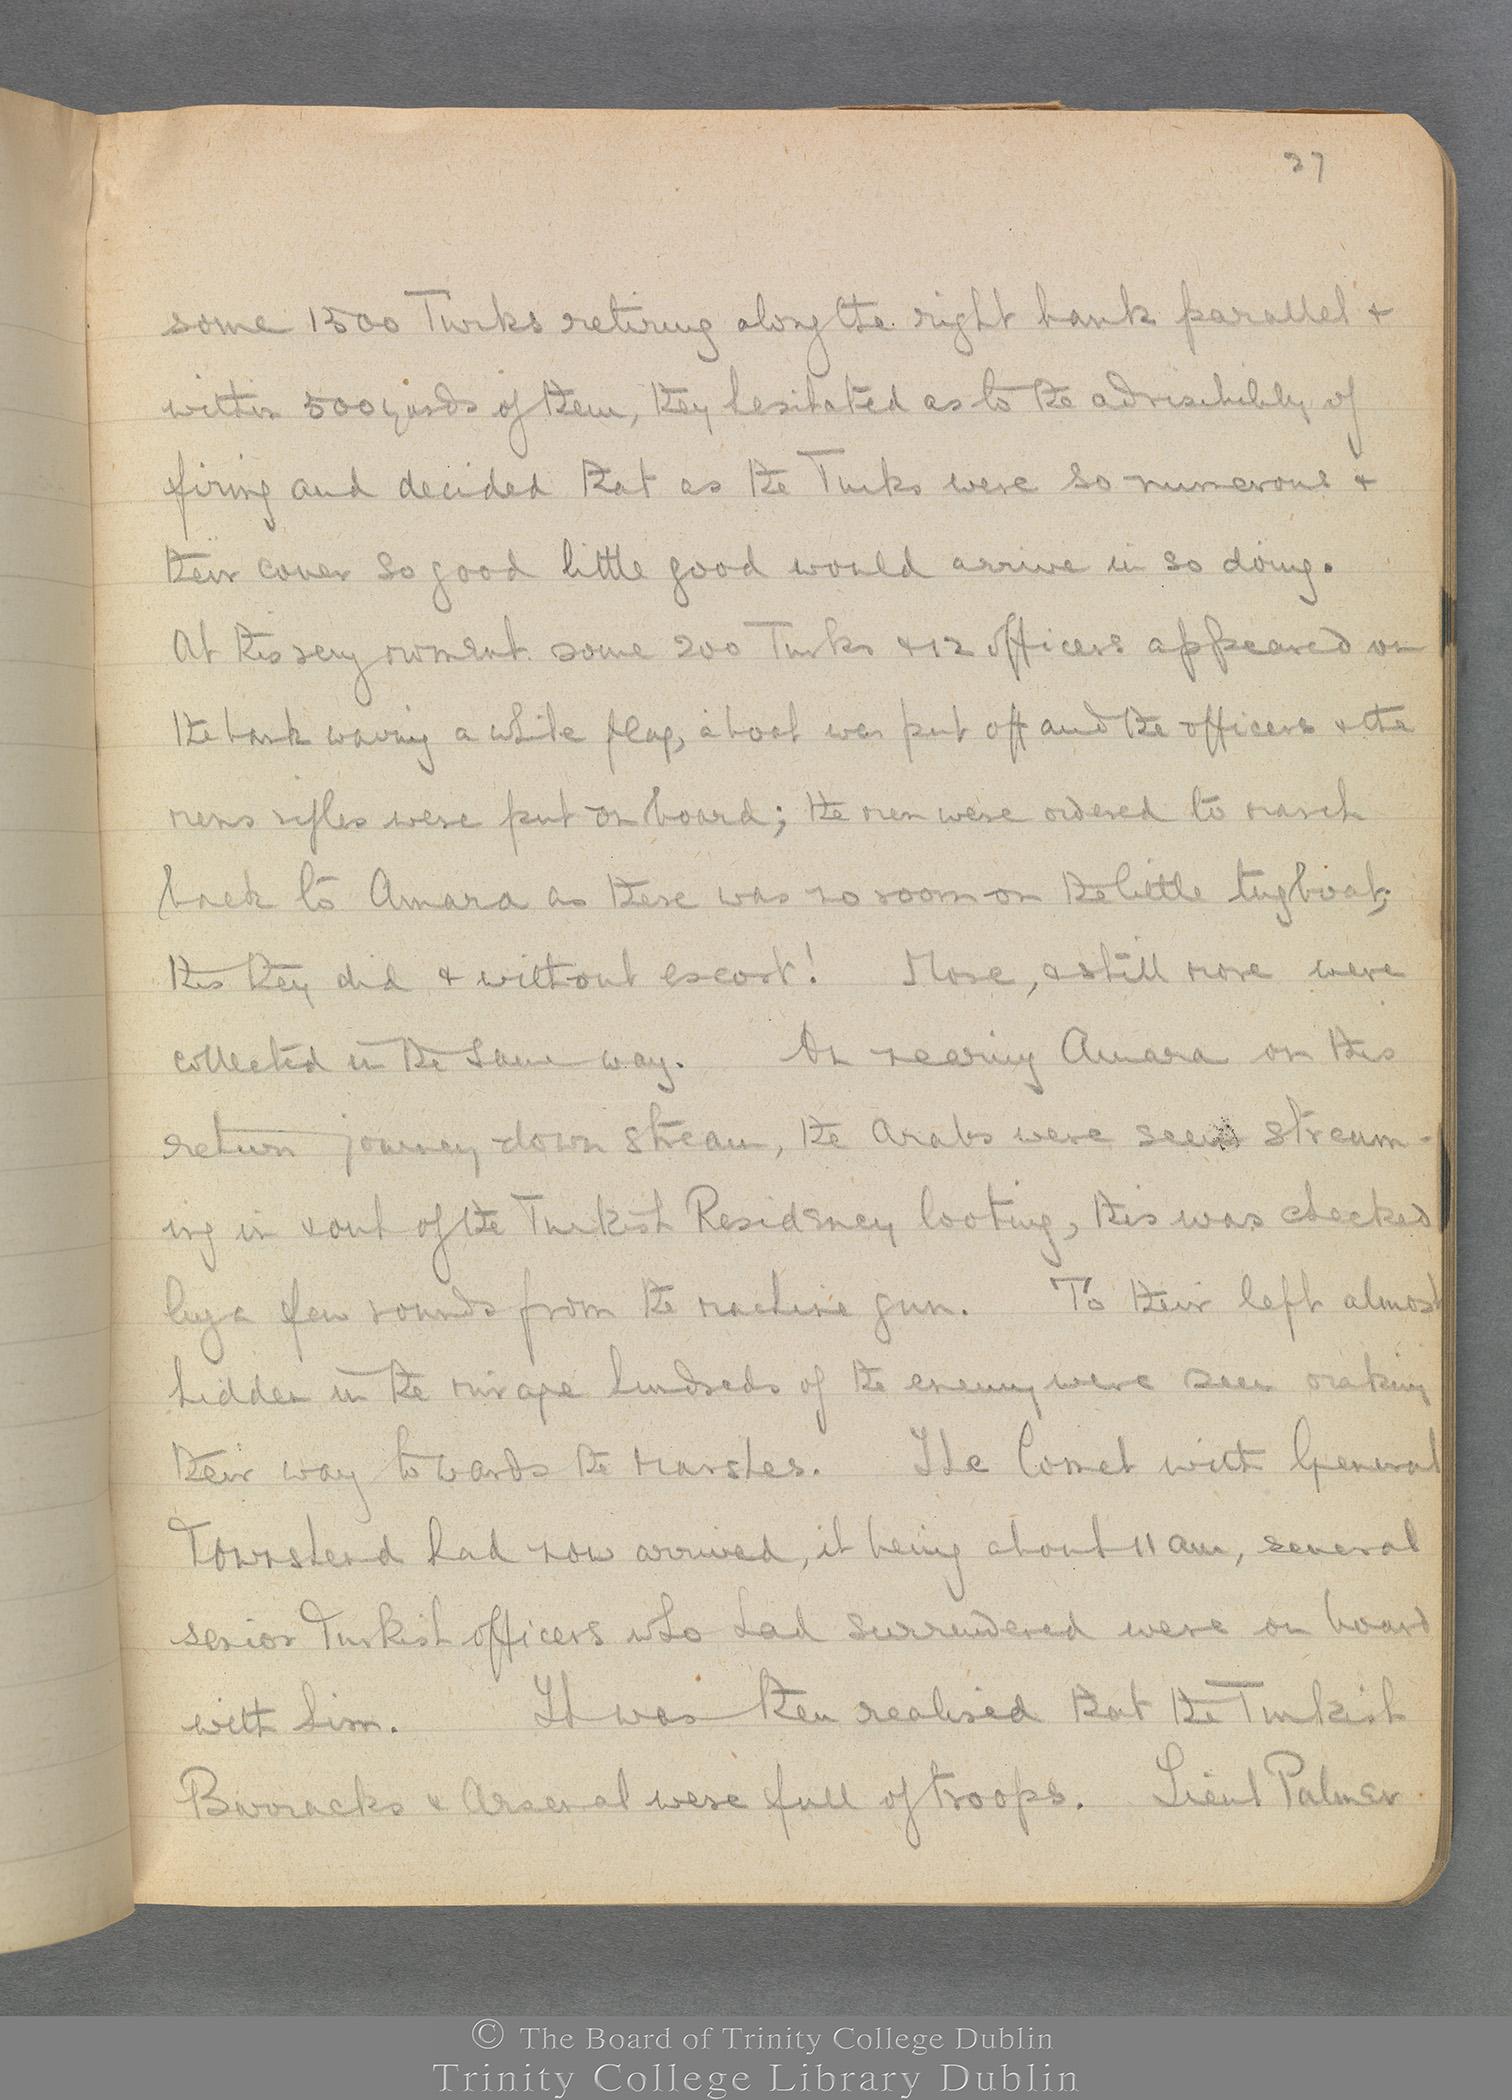 TCD MS 3414 folio 27 recto